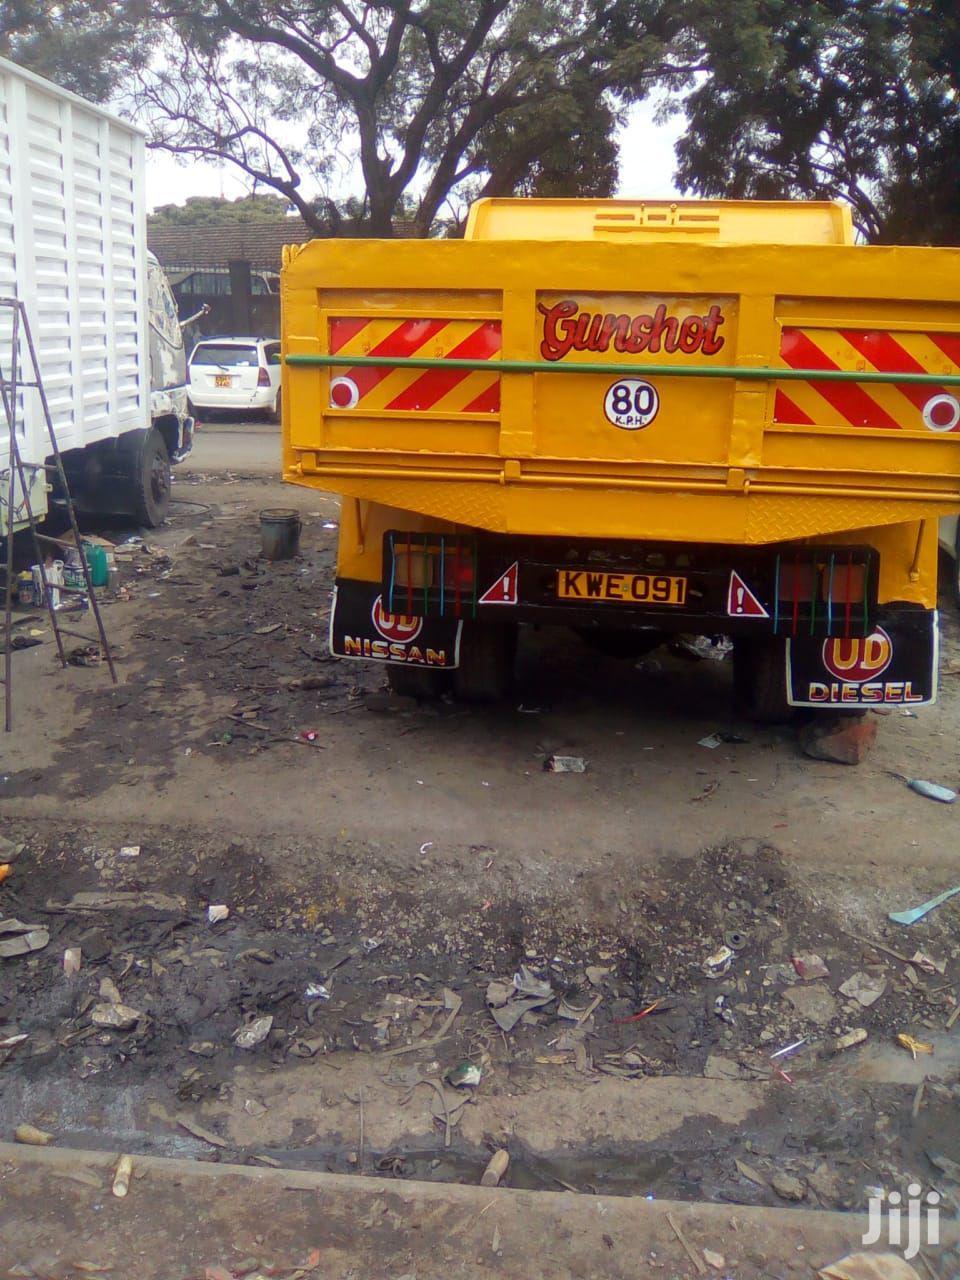 Nissan Ud Tipper Truck | Trucks & Trailers for sale in Nairobi Central, Nairobi, Kenya